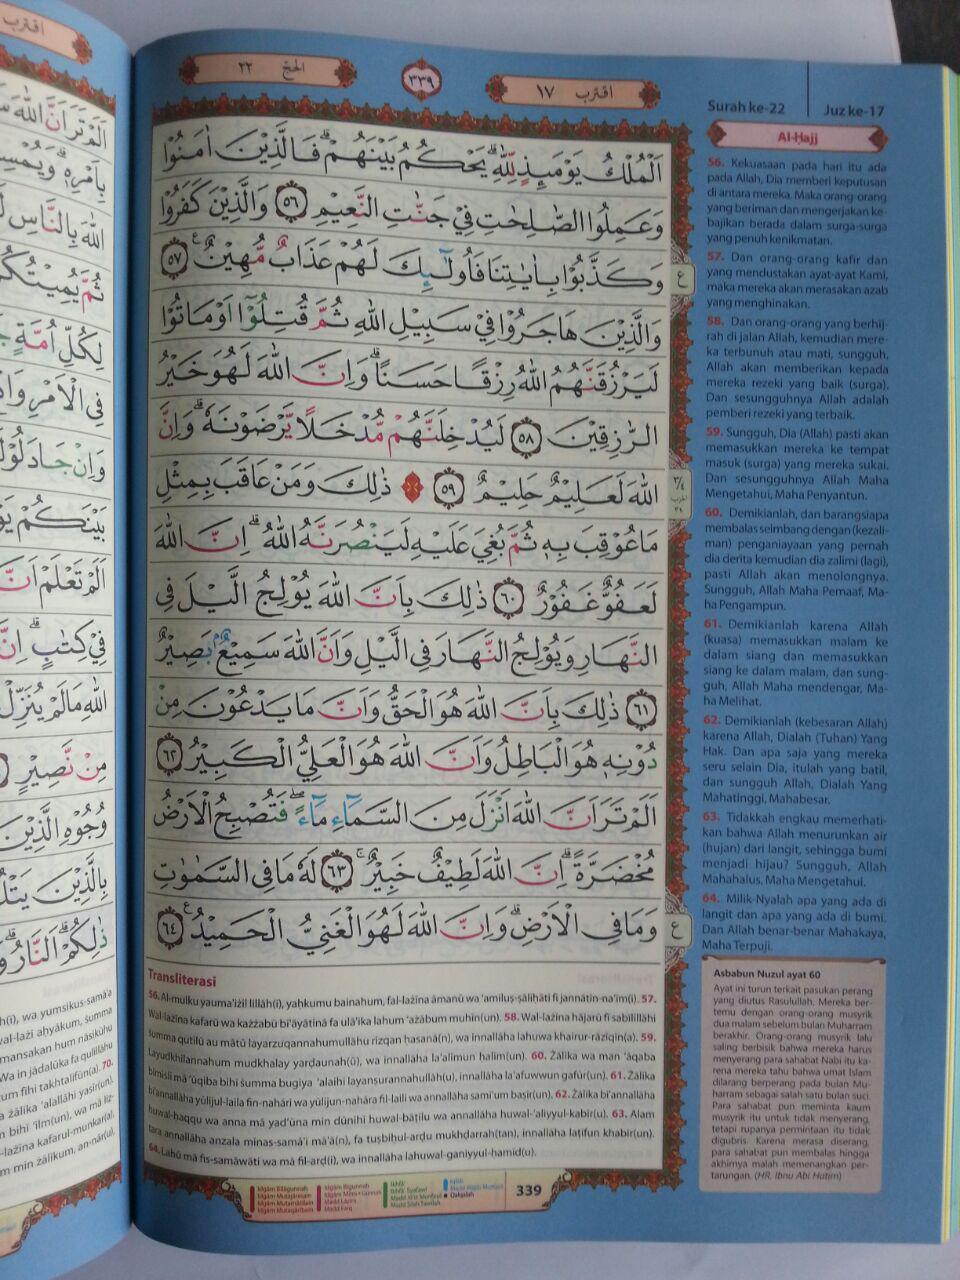 Al-Qur'an Almunawwar Tajwid Warna Transliterasi Terjemah Perayat A5 isi 2